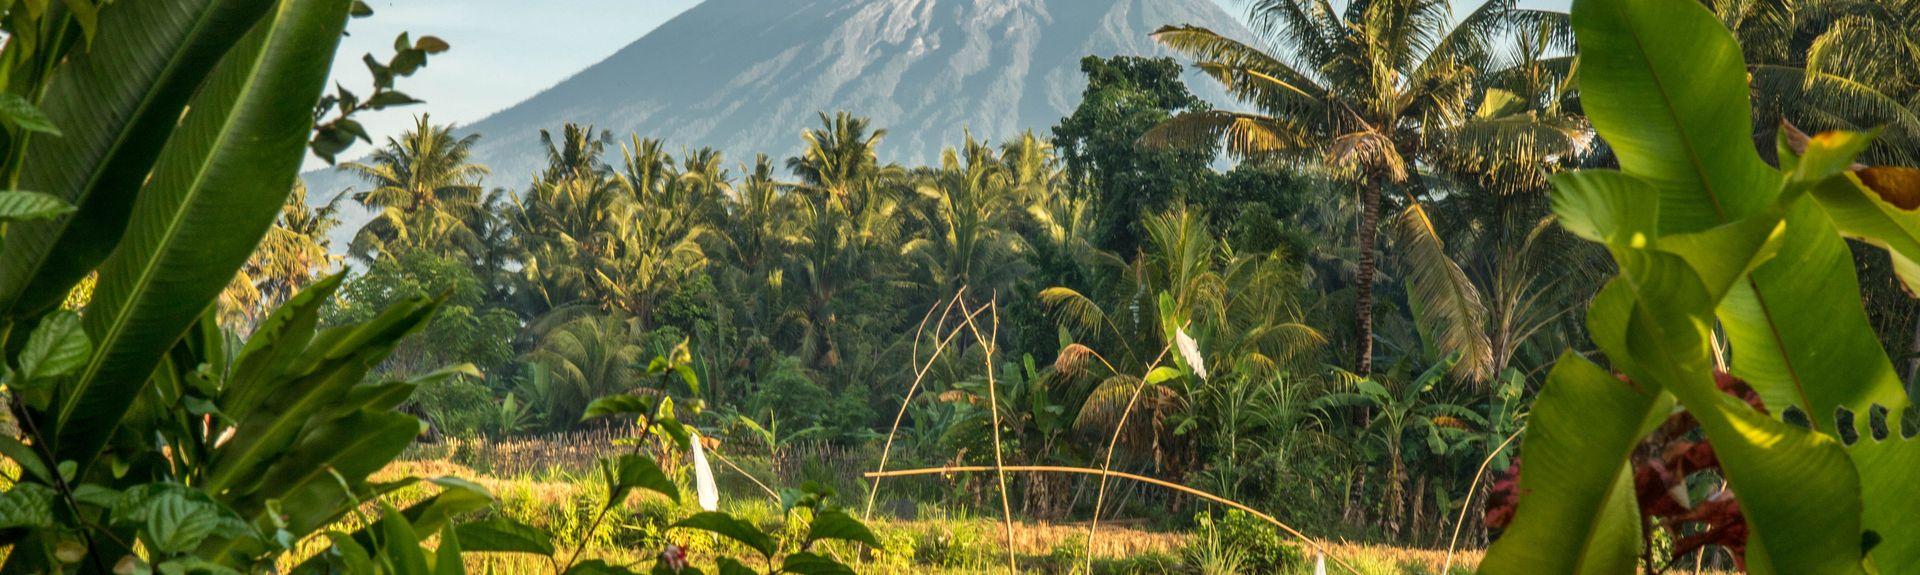 Bunutan, Abang, Karangasem Regency, Bali, Indonesia